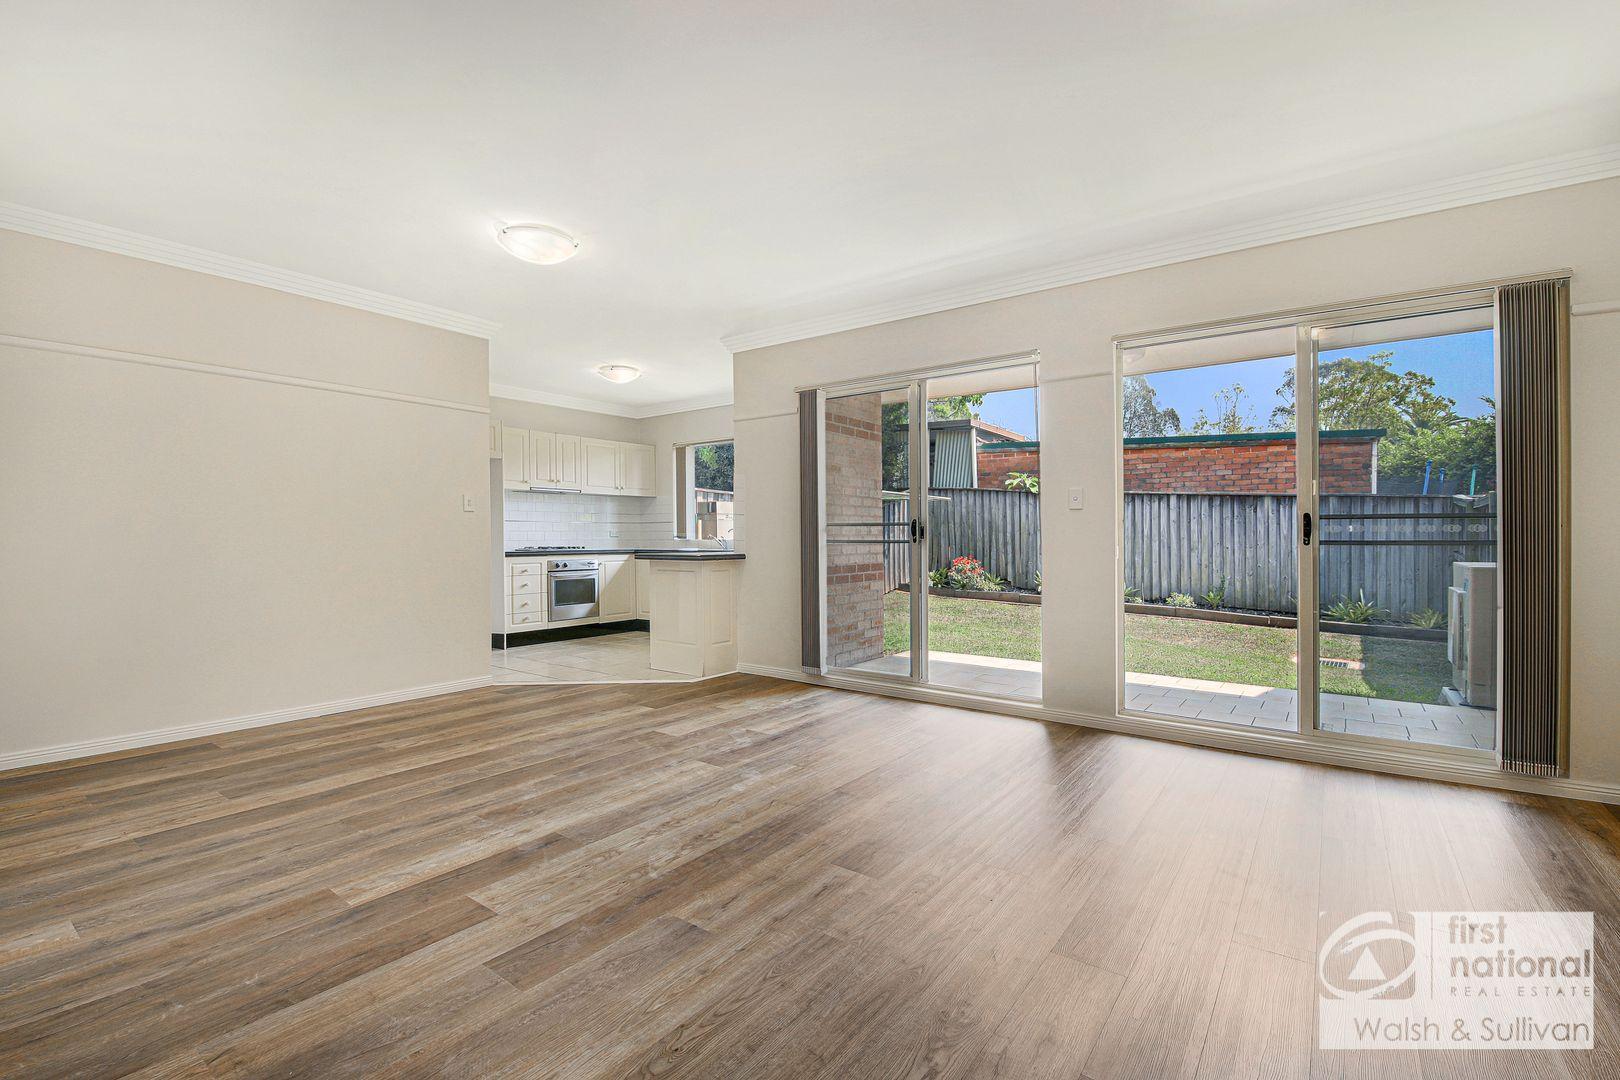 15/29-35 Pearce Street, Baulkham Hills NSW 2153, Image 1